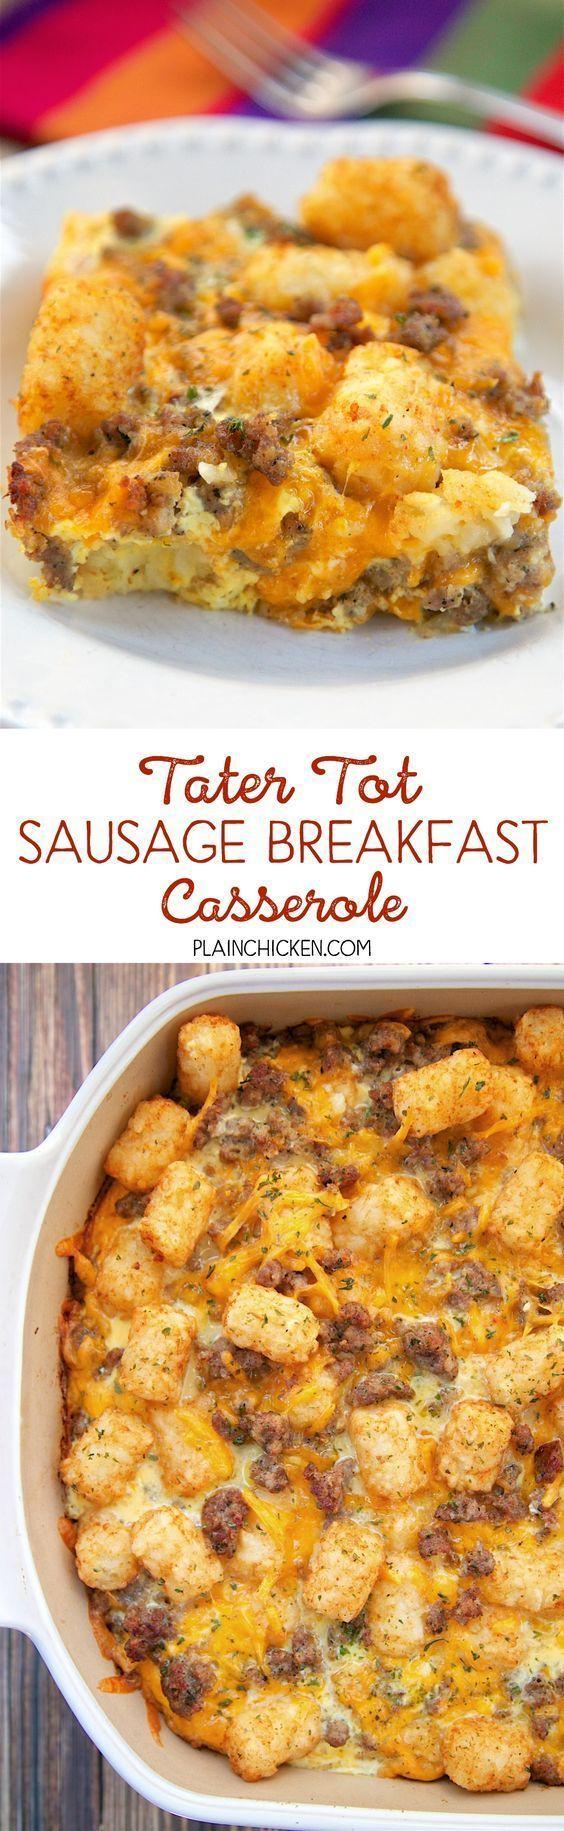 Photo of Tater Tot Sausage Breakfast Casserole